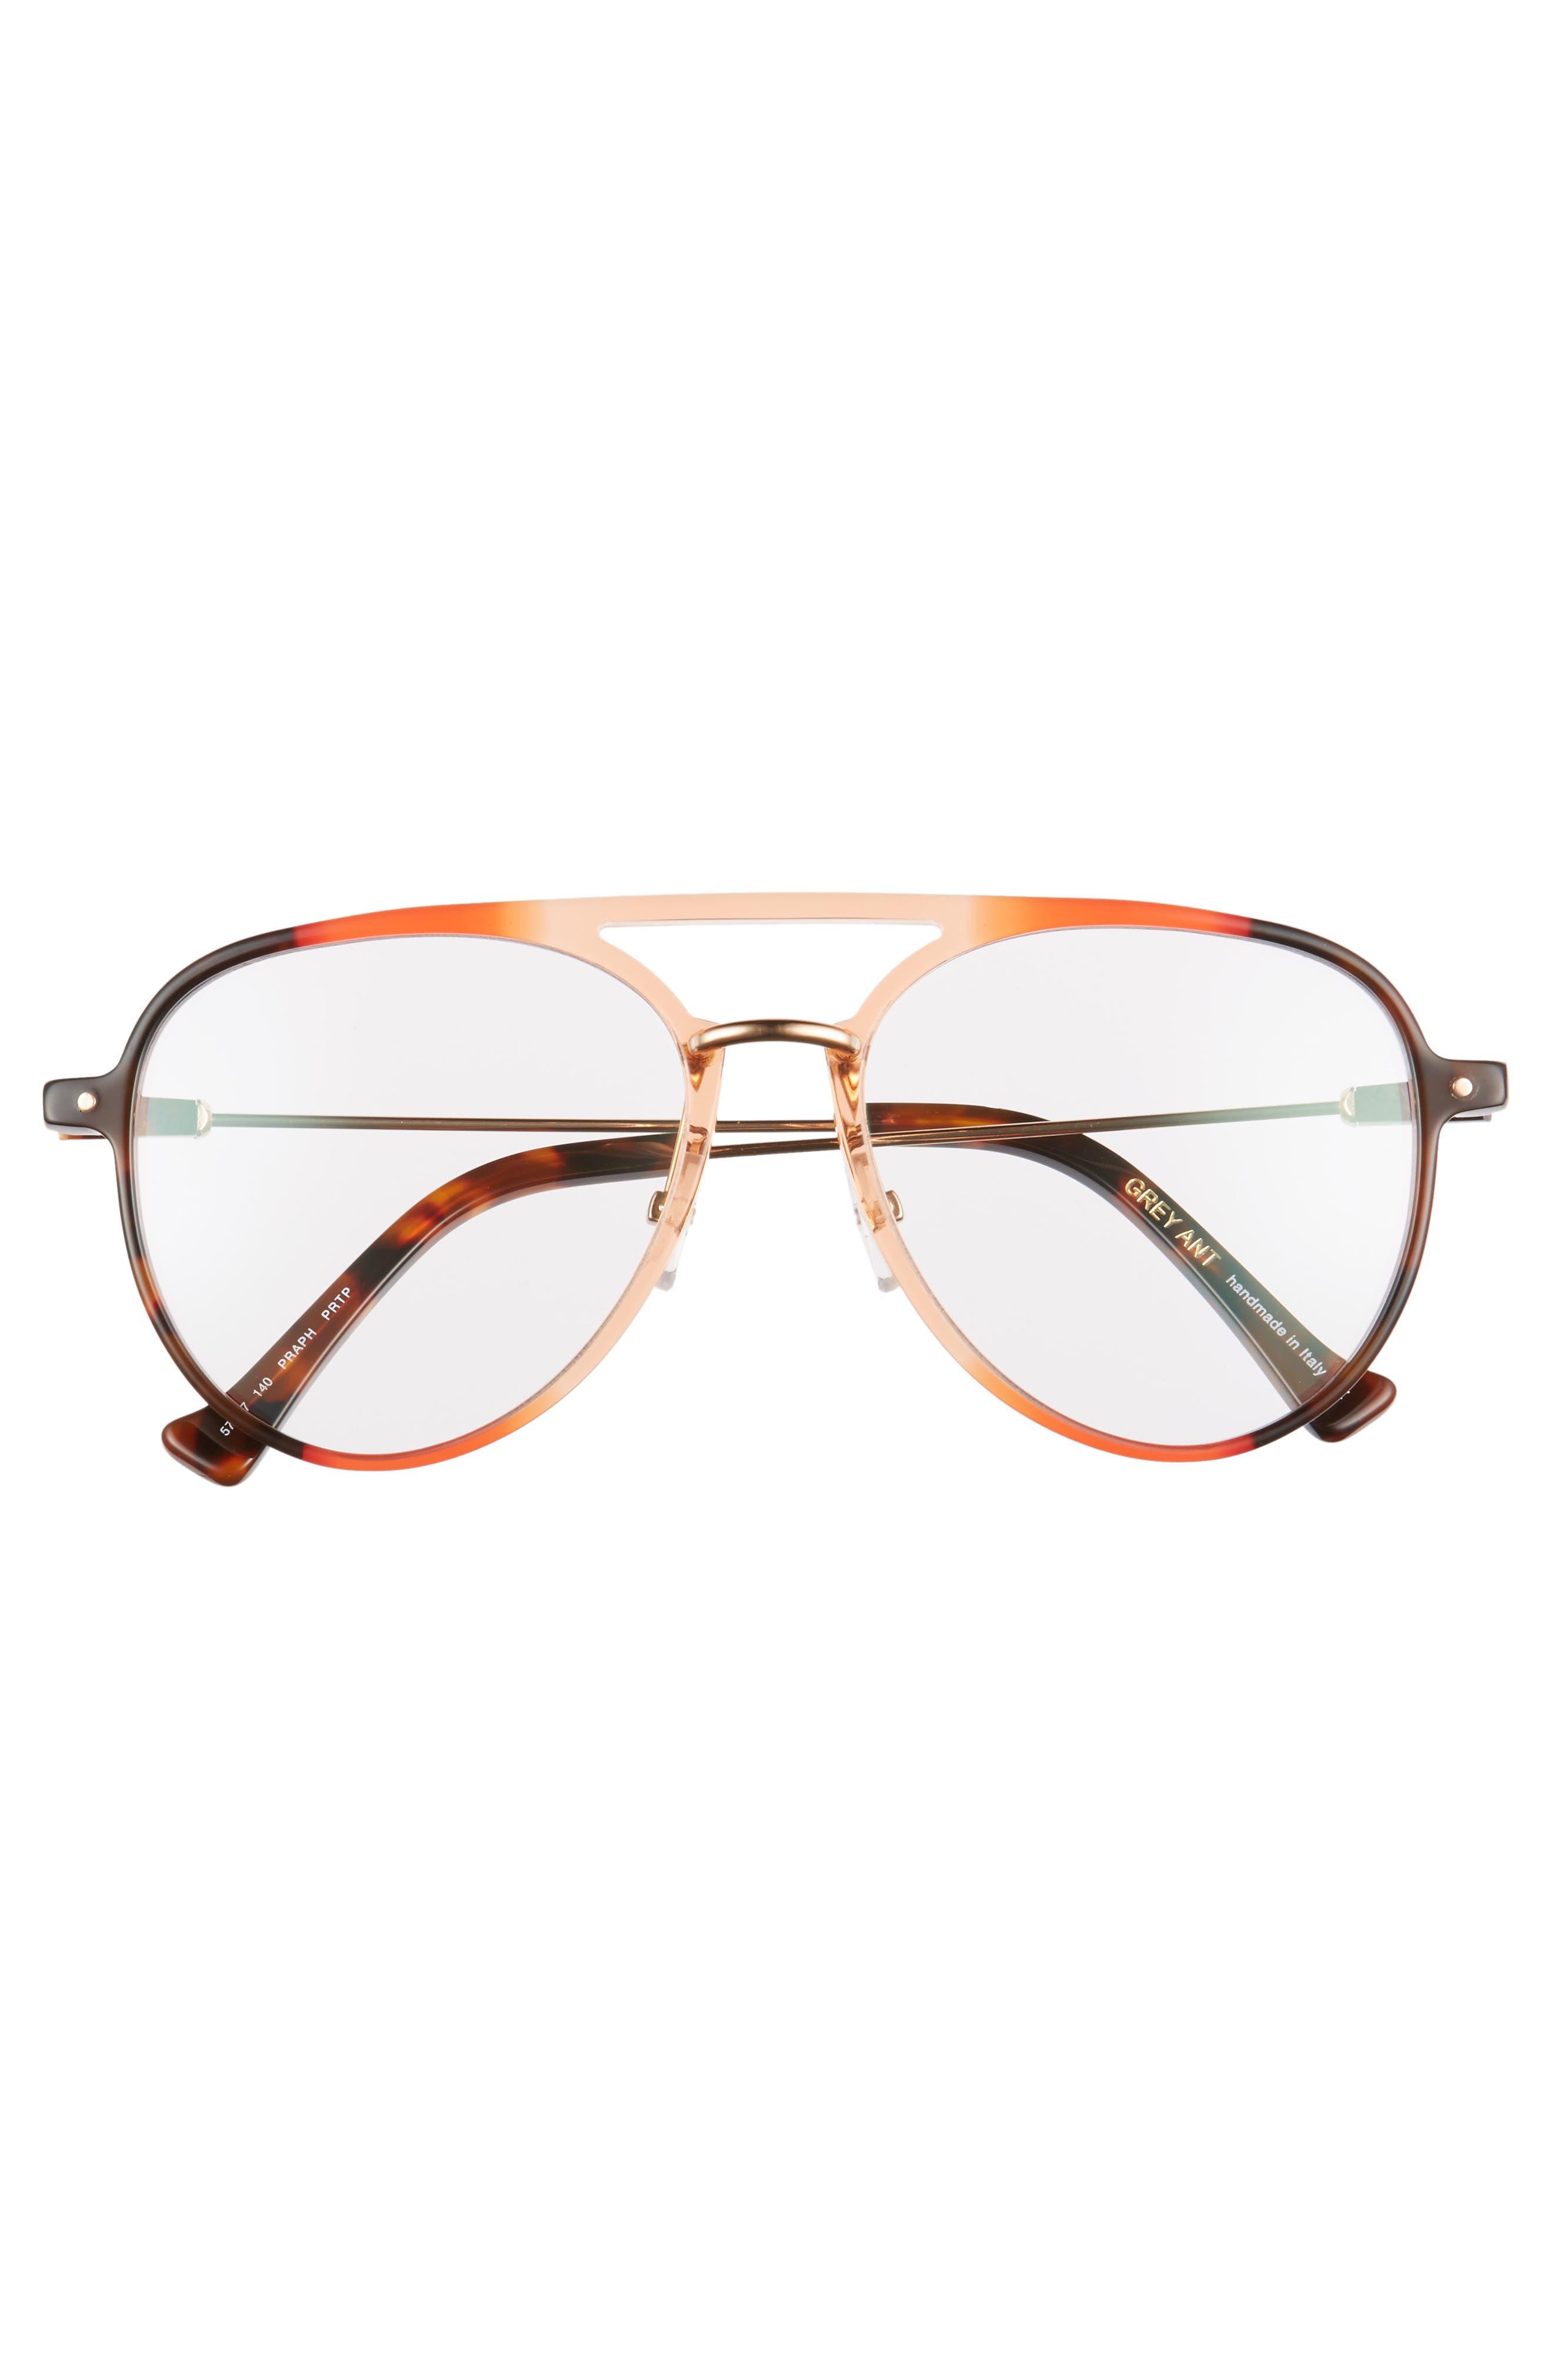 Praph 57mm Aviator Glasses,                             Alternate thumbnail 3, color,                             Clear/Amber Tort Hardware